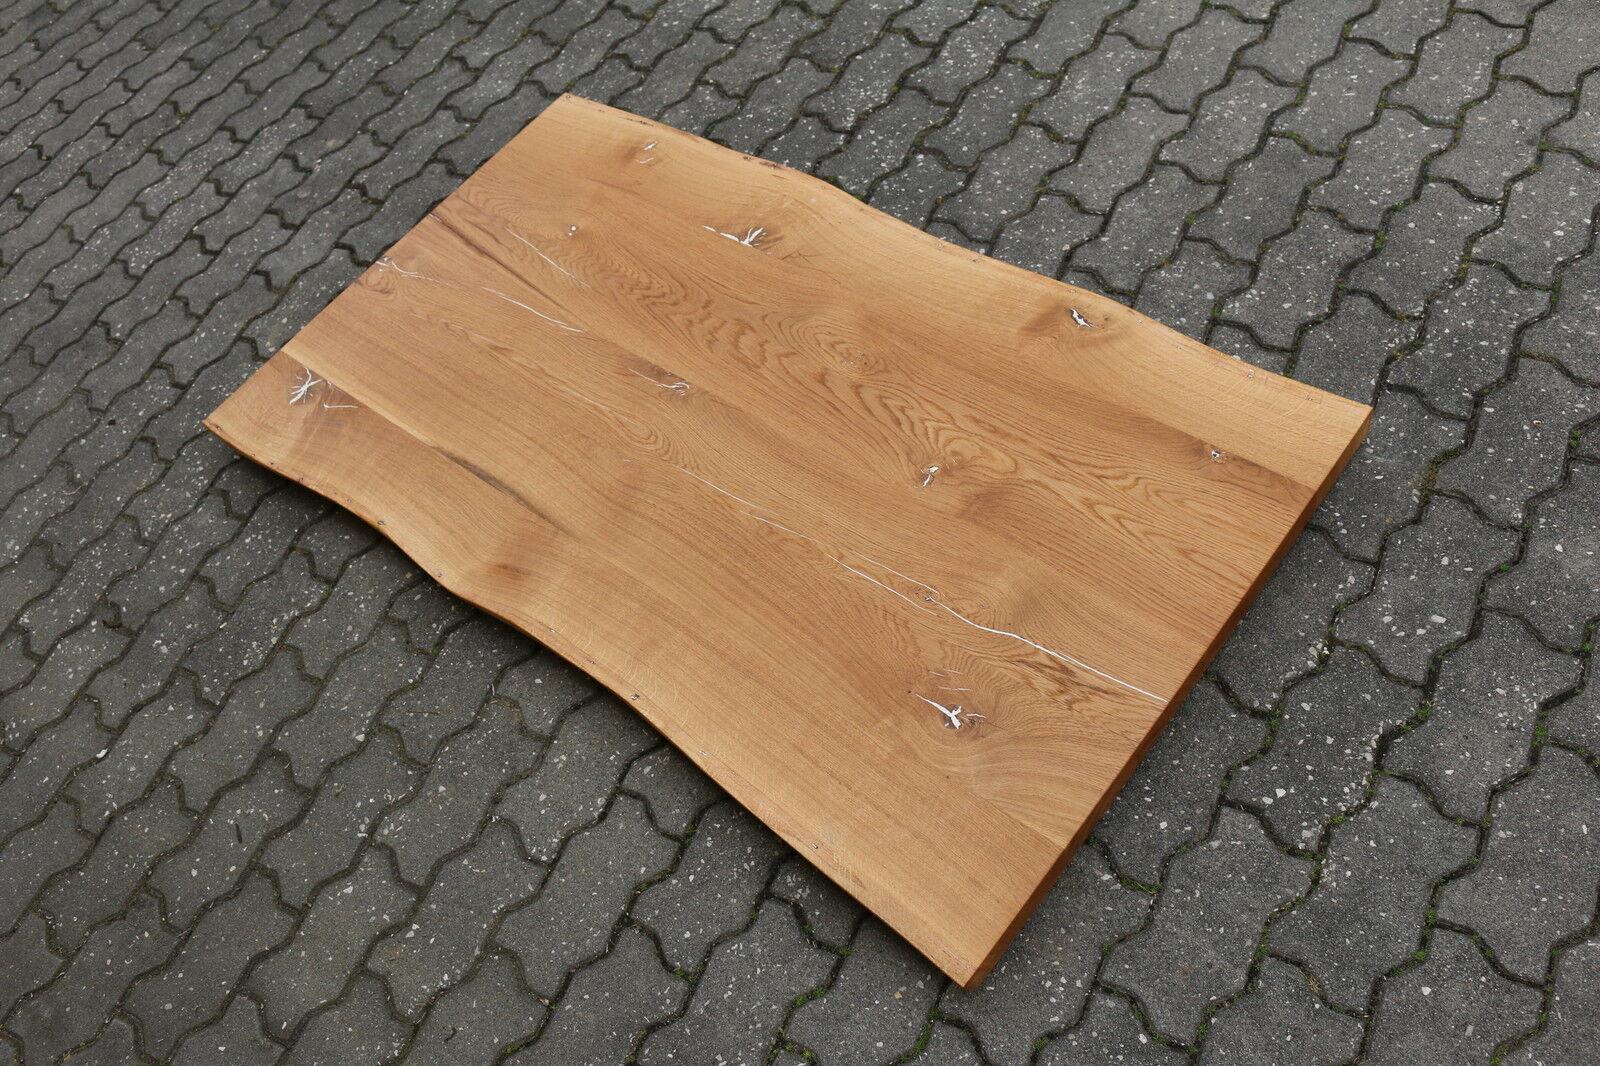 tischplatte platte eiche wild rustikal massiv holz mit baumkante neu leimholz eur 700 00. Black Bedroom Furniture Sets. Home Design Ideas